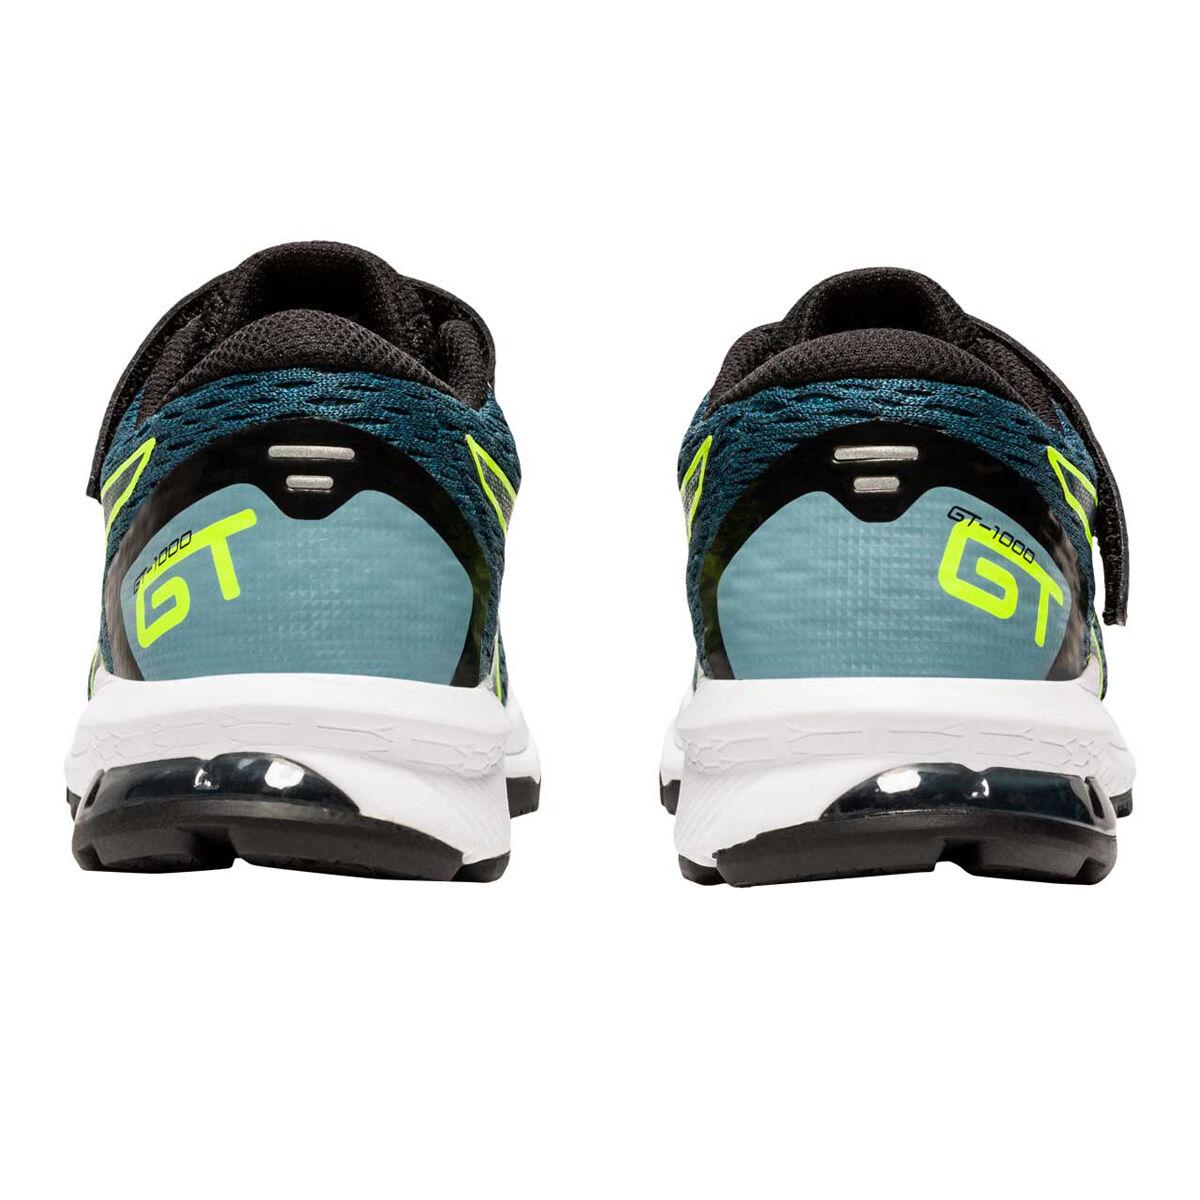 Asics GT 1000 9 Kids Running Shoes Teal